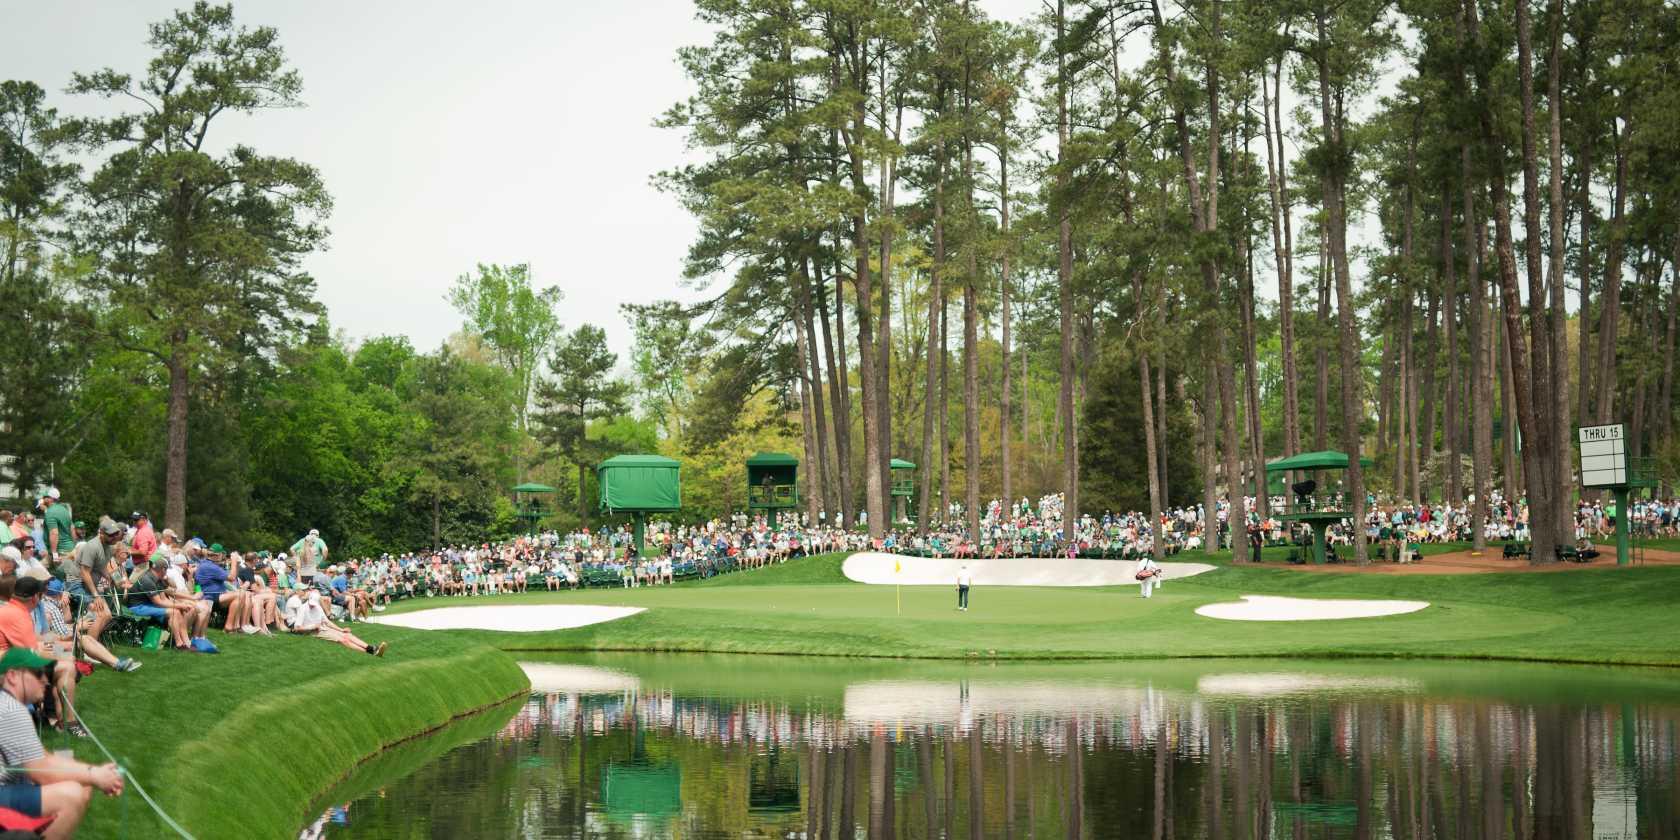 Masters Golf Tournament 2020 in Augusta | FAQ & Events